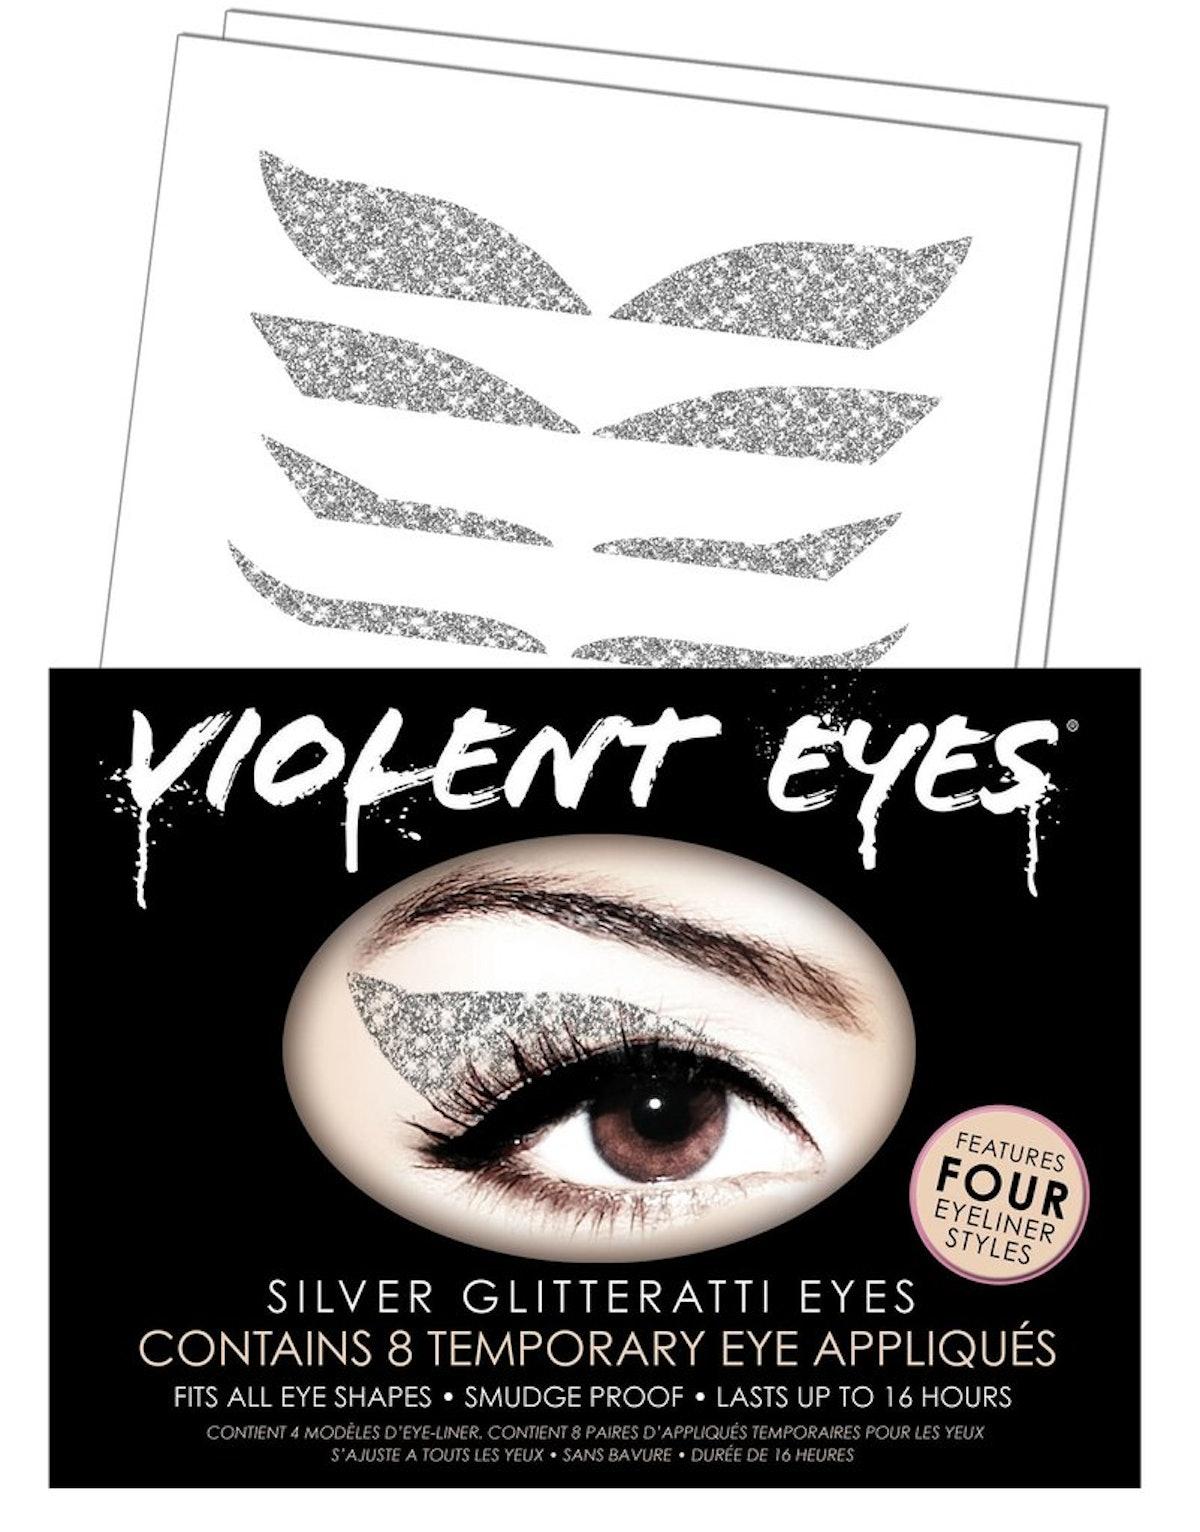 Violent Eyes Silver Glitterati Appliqués